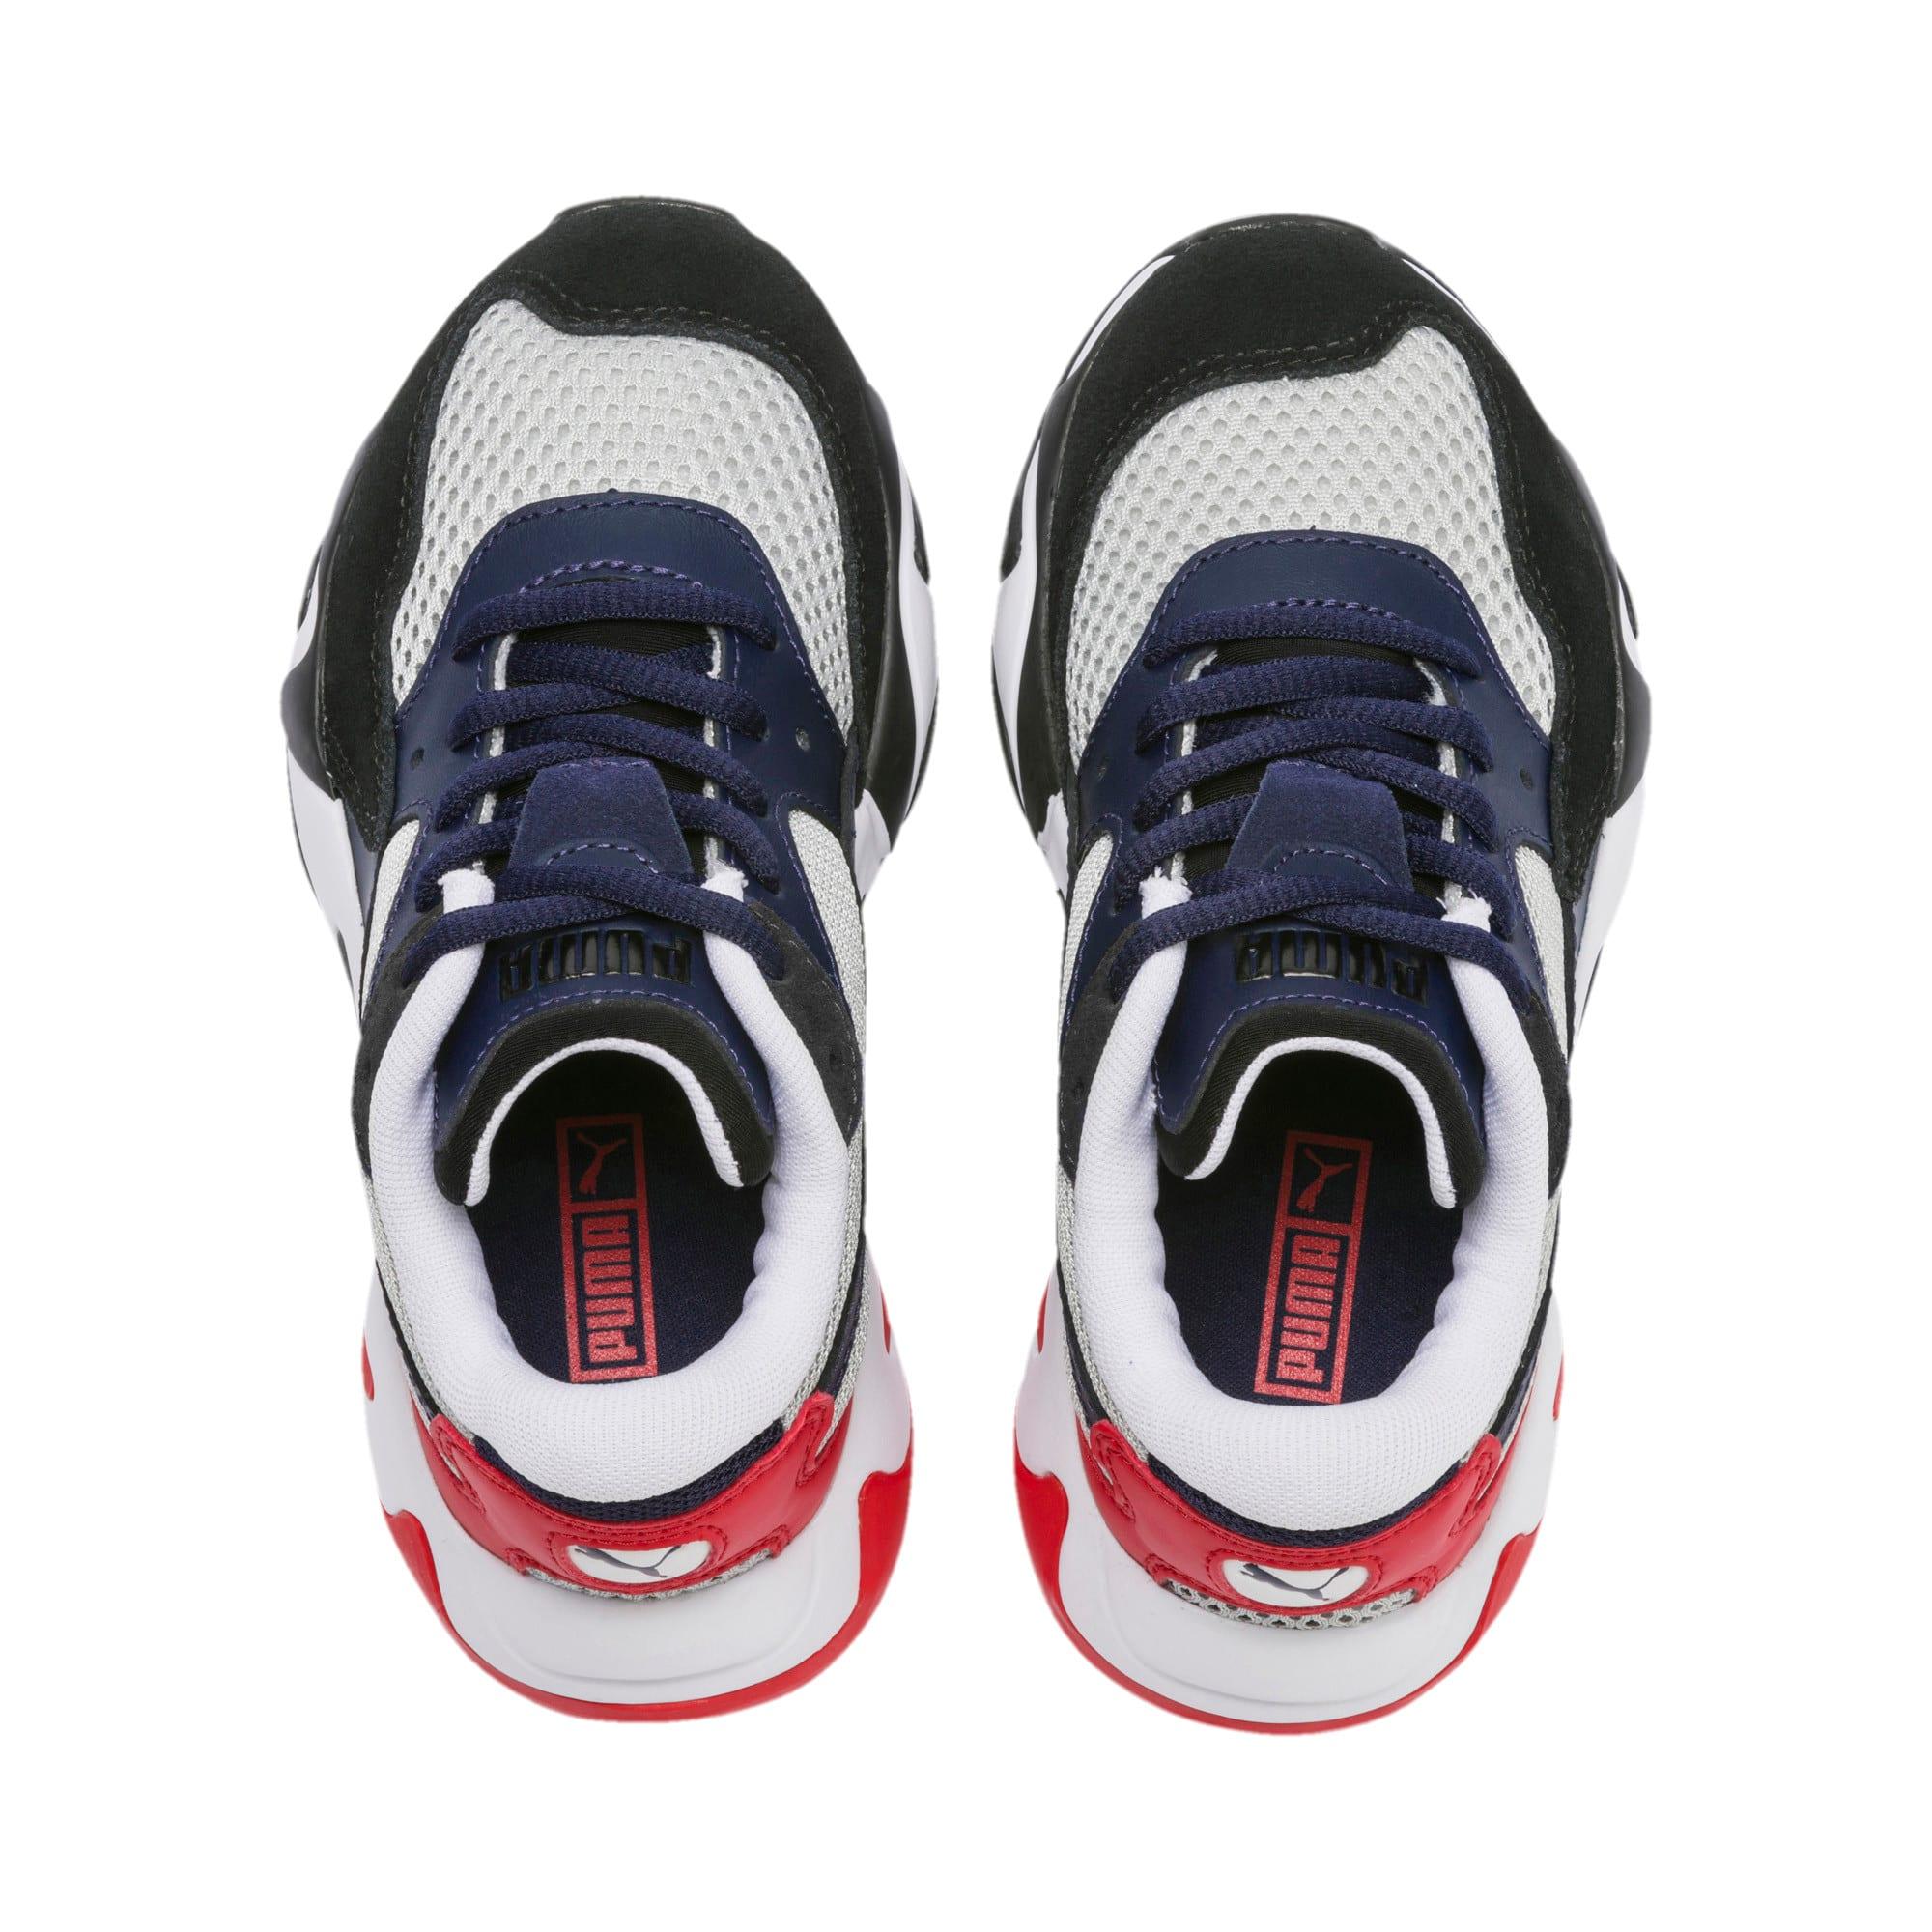 Imagen en miniatura 6 de Zapatillas de niño Storm Origin, Puma Black-High Rise, mediana